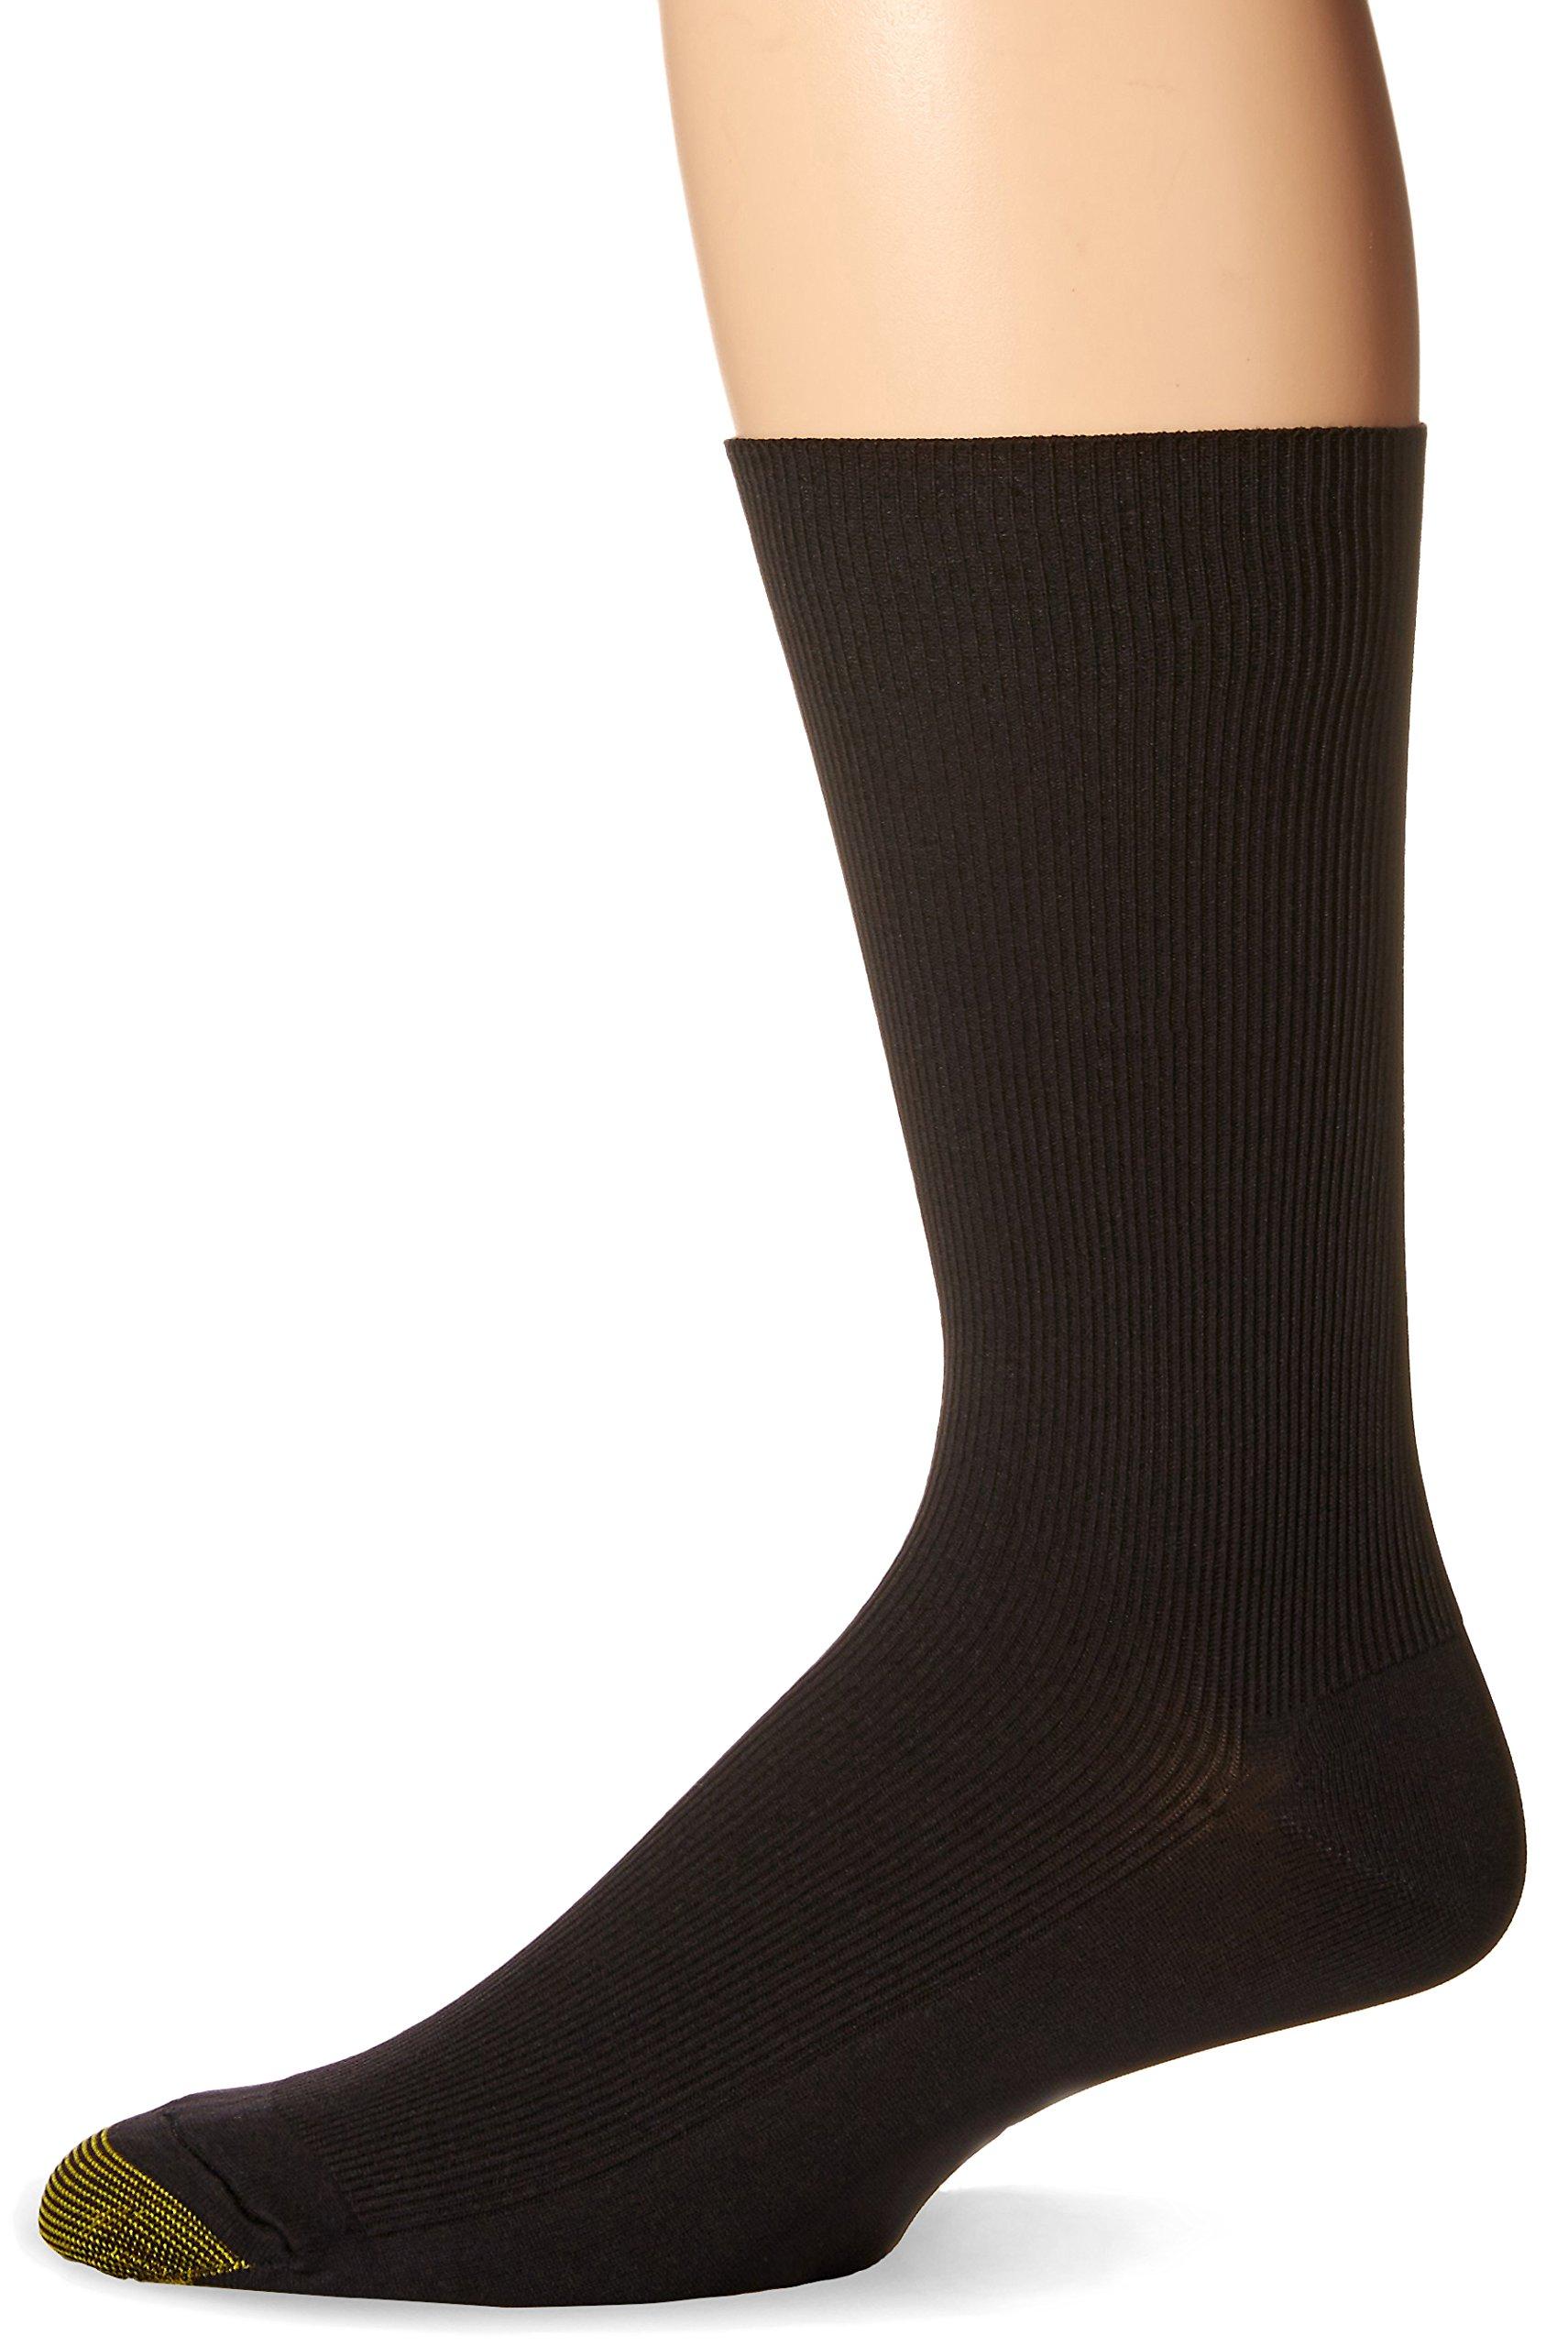 Gold Toe Men's Metropolitan Dress Sock, Black, 3-Pack Sock Size 10-13 by Gold Toe